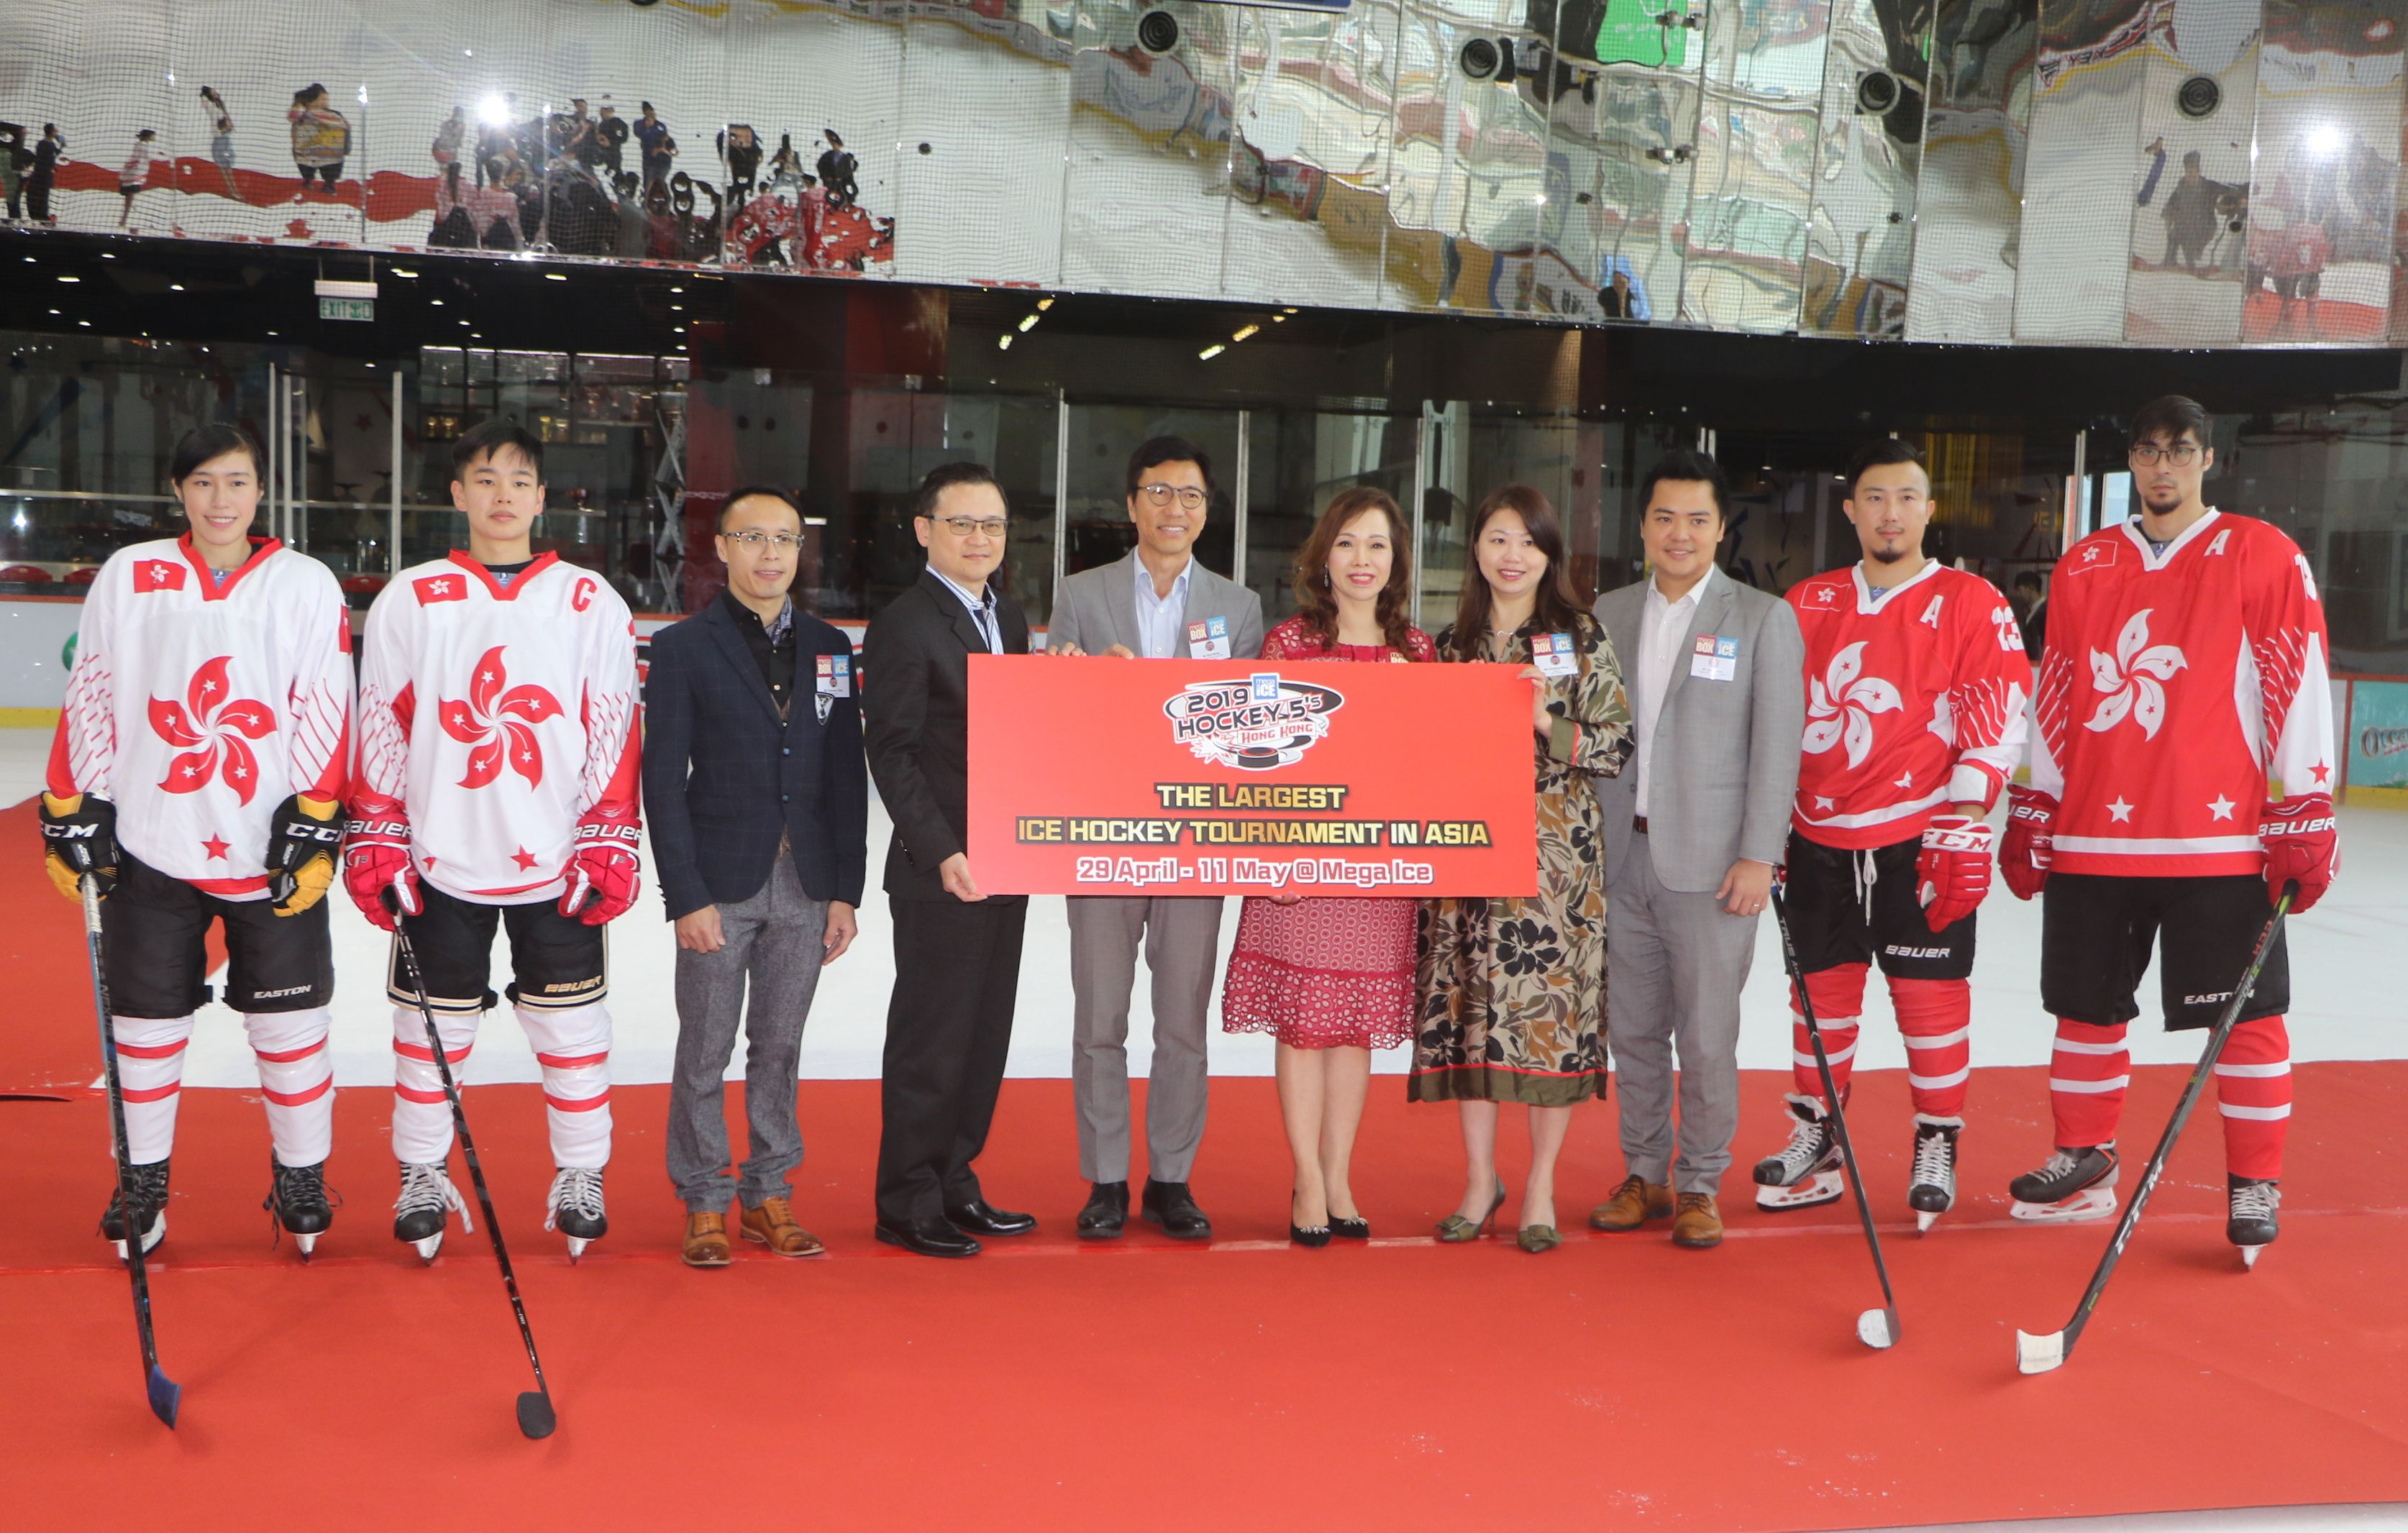 Mega Ice五人冰球賽本月廿九日起在九龍灣Mega Box開戰。王嘉豪攝